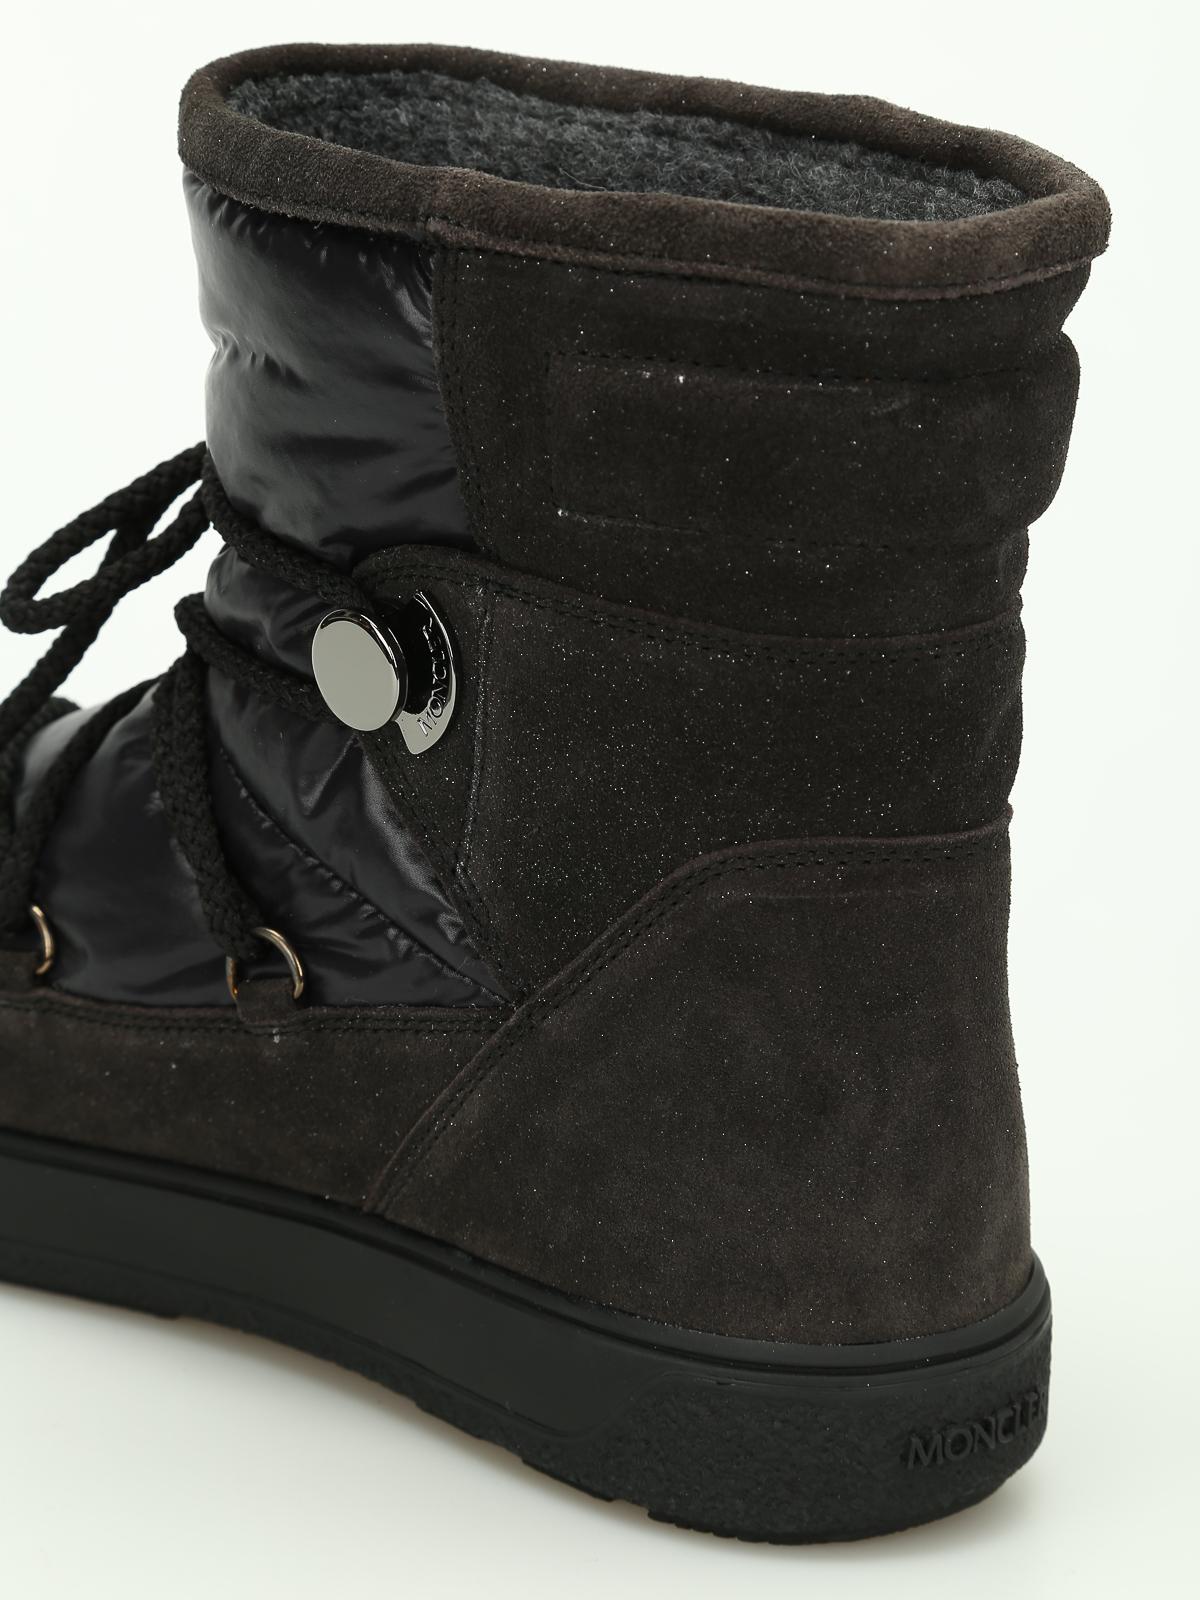 Moncler New Fanny snow boots snow boots NEWFANNY019DG999